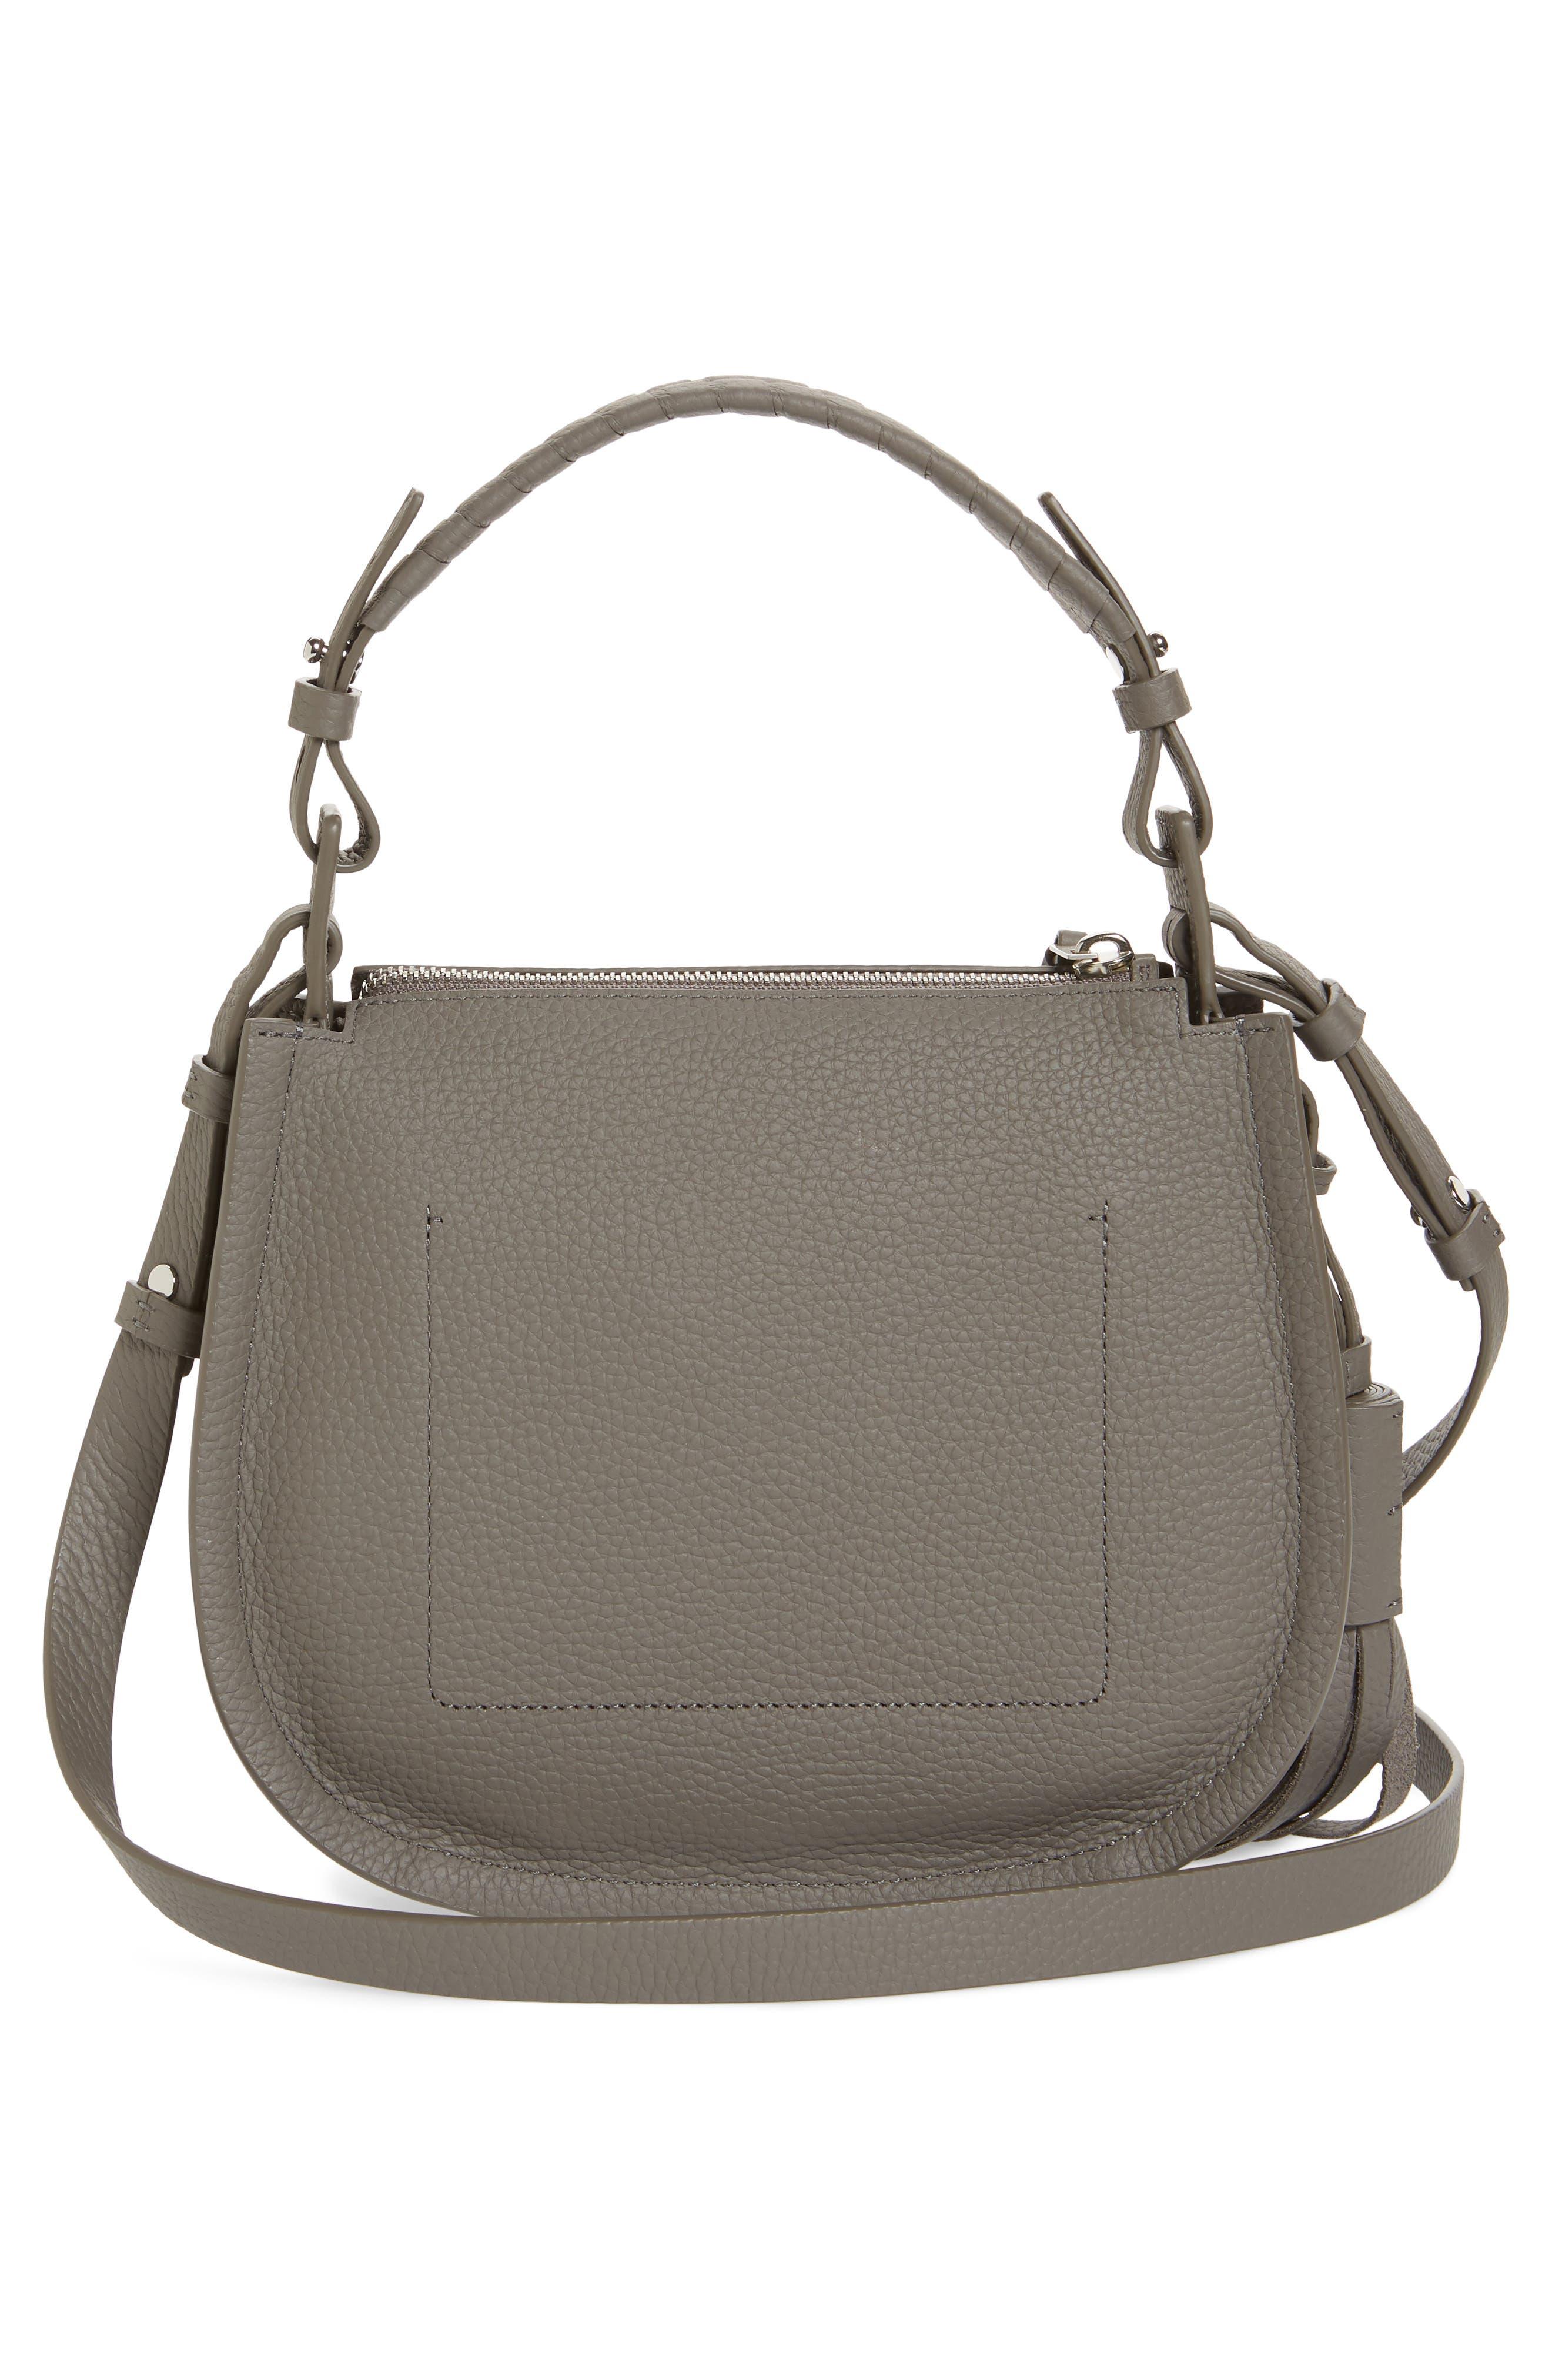 ALLSAINTS, Mori Leather Crossbody Bag, Alternate thumbnail 3, color, STORM GREY